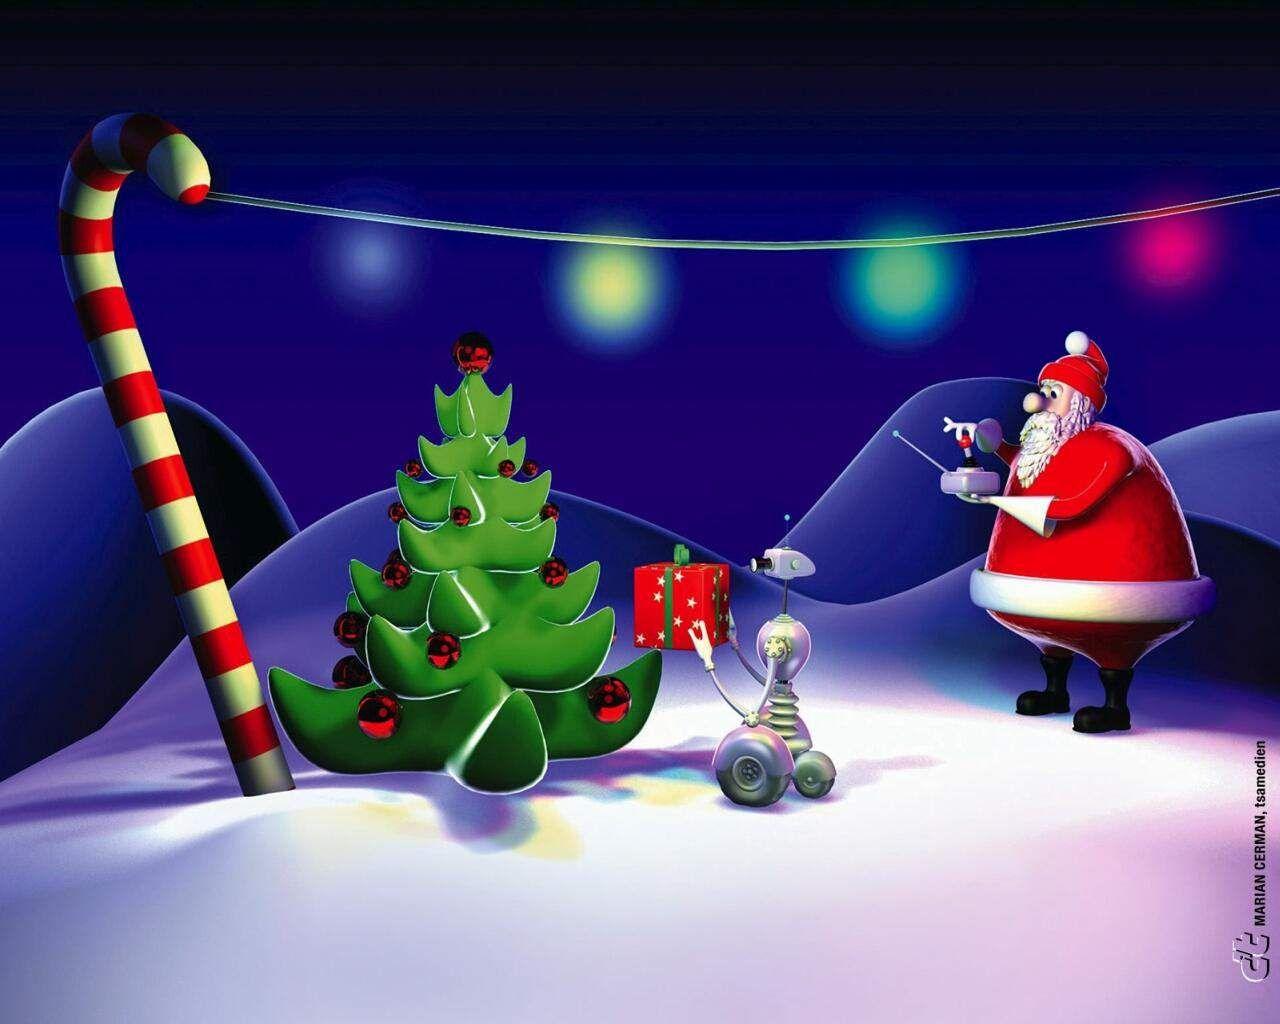 New Santa Animated Merry Christmas Hd Wallpaper Wallpaper With Animated Christmas Wallpaper Christmas Wallpaper Christmas Toys